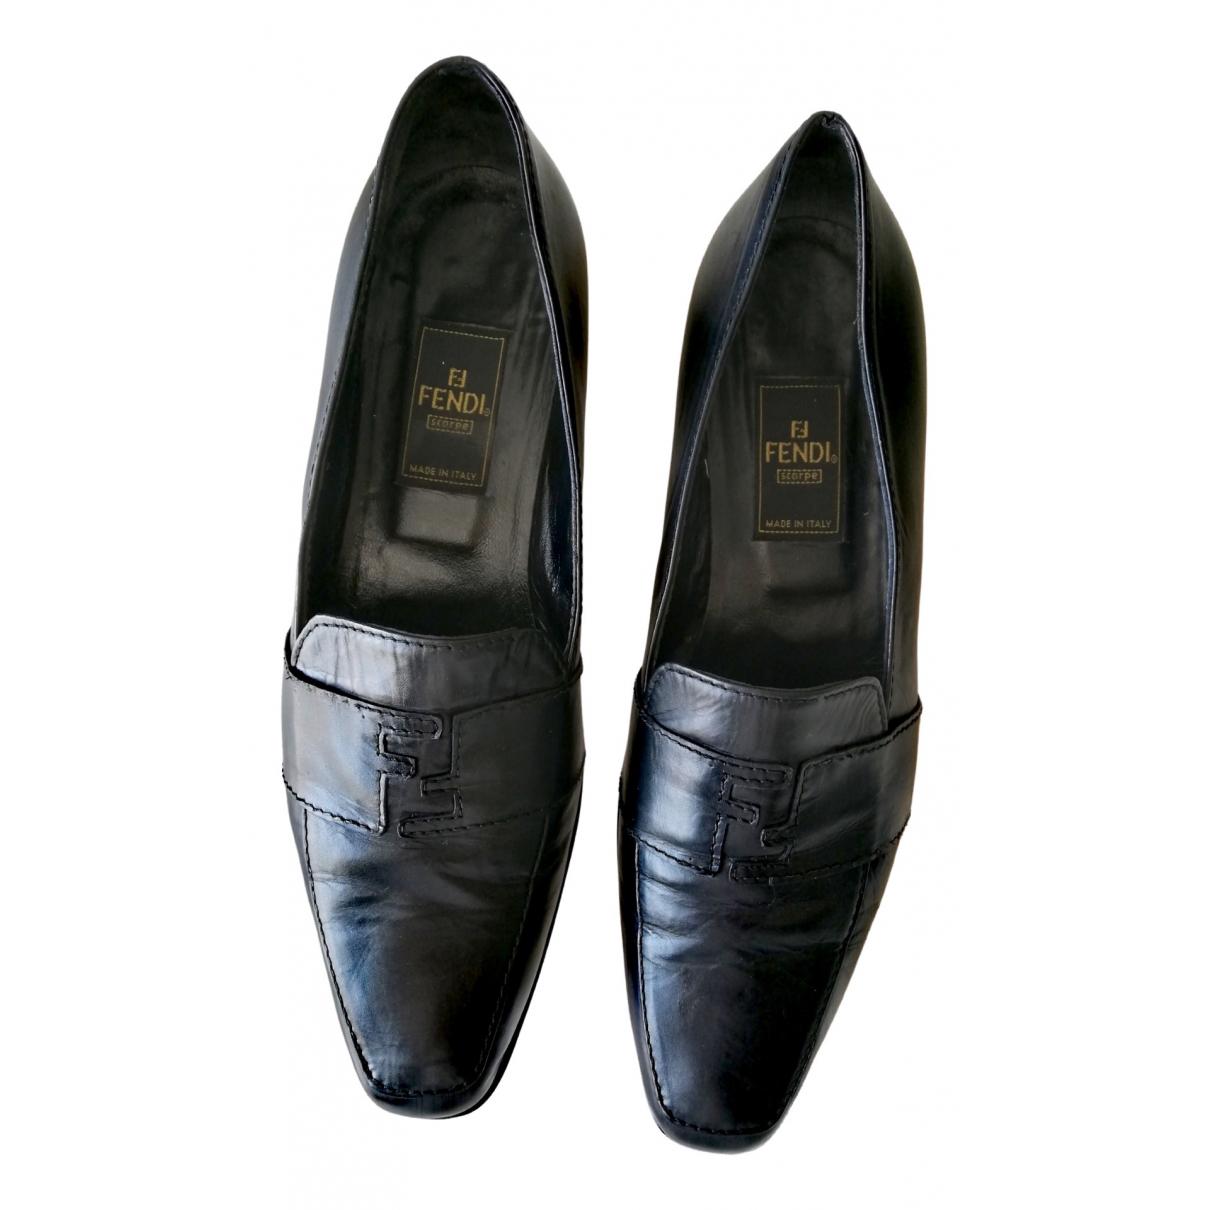 Fendi \N Black Leather Flats for Women 37 EU